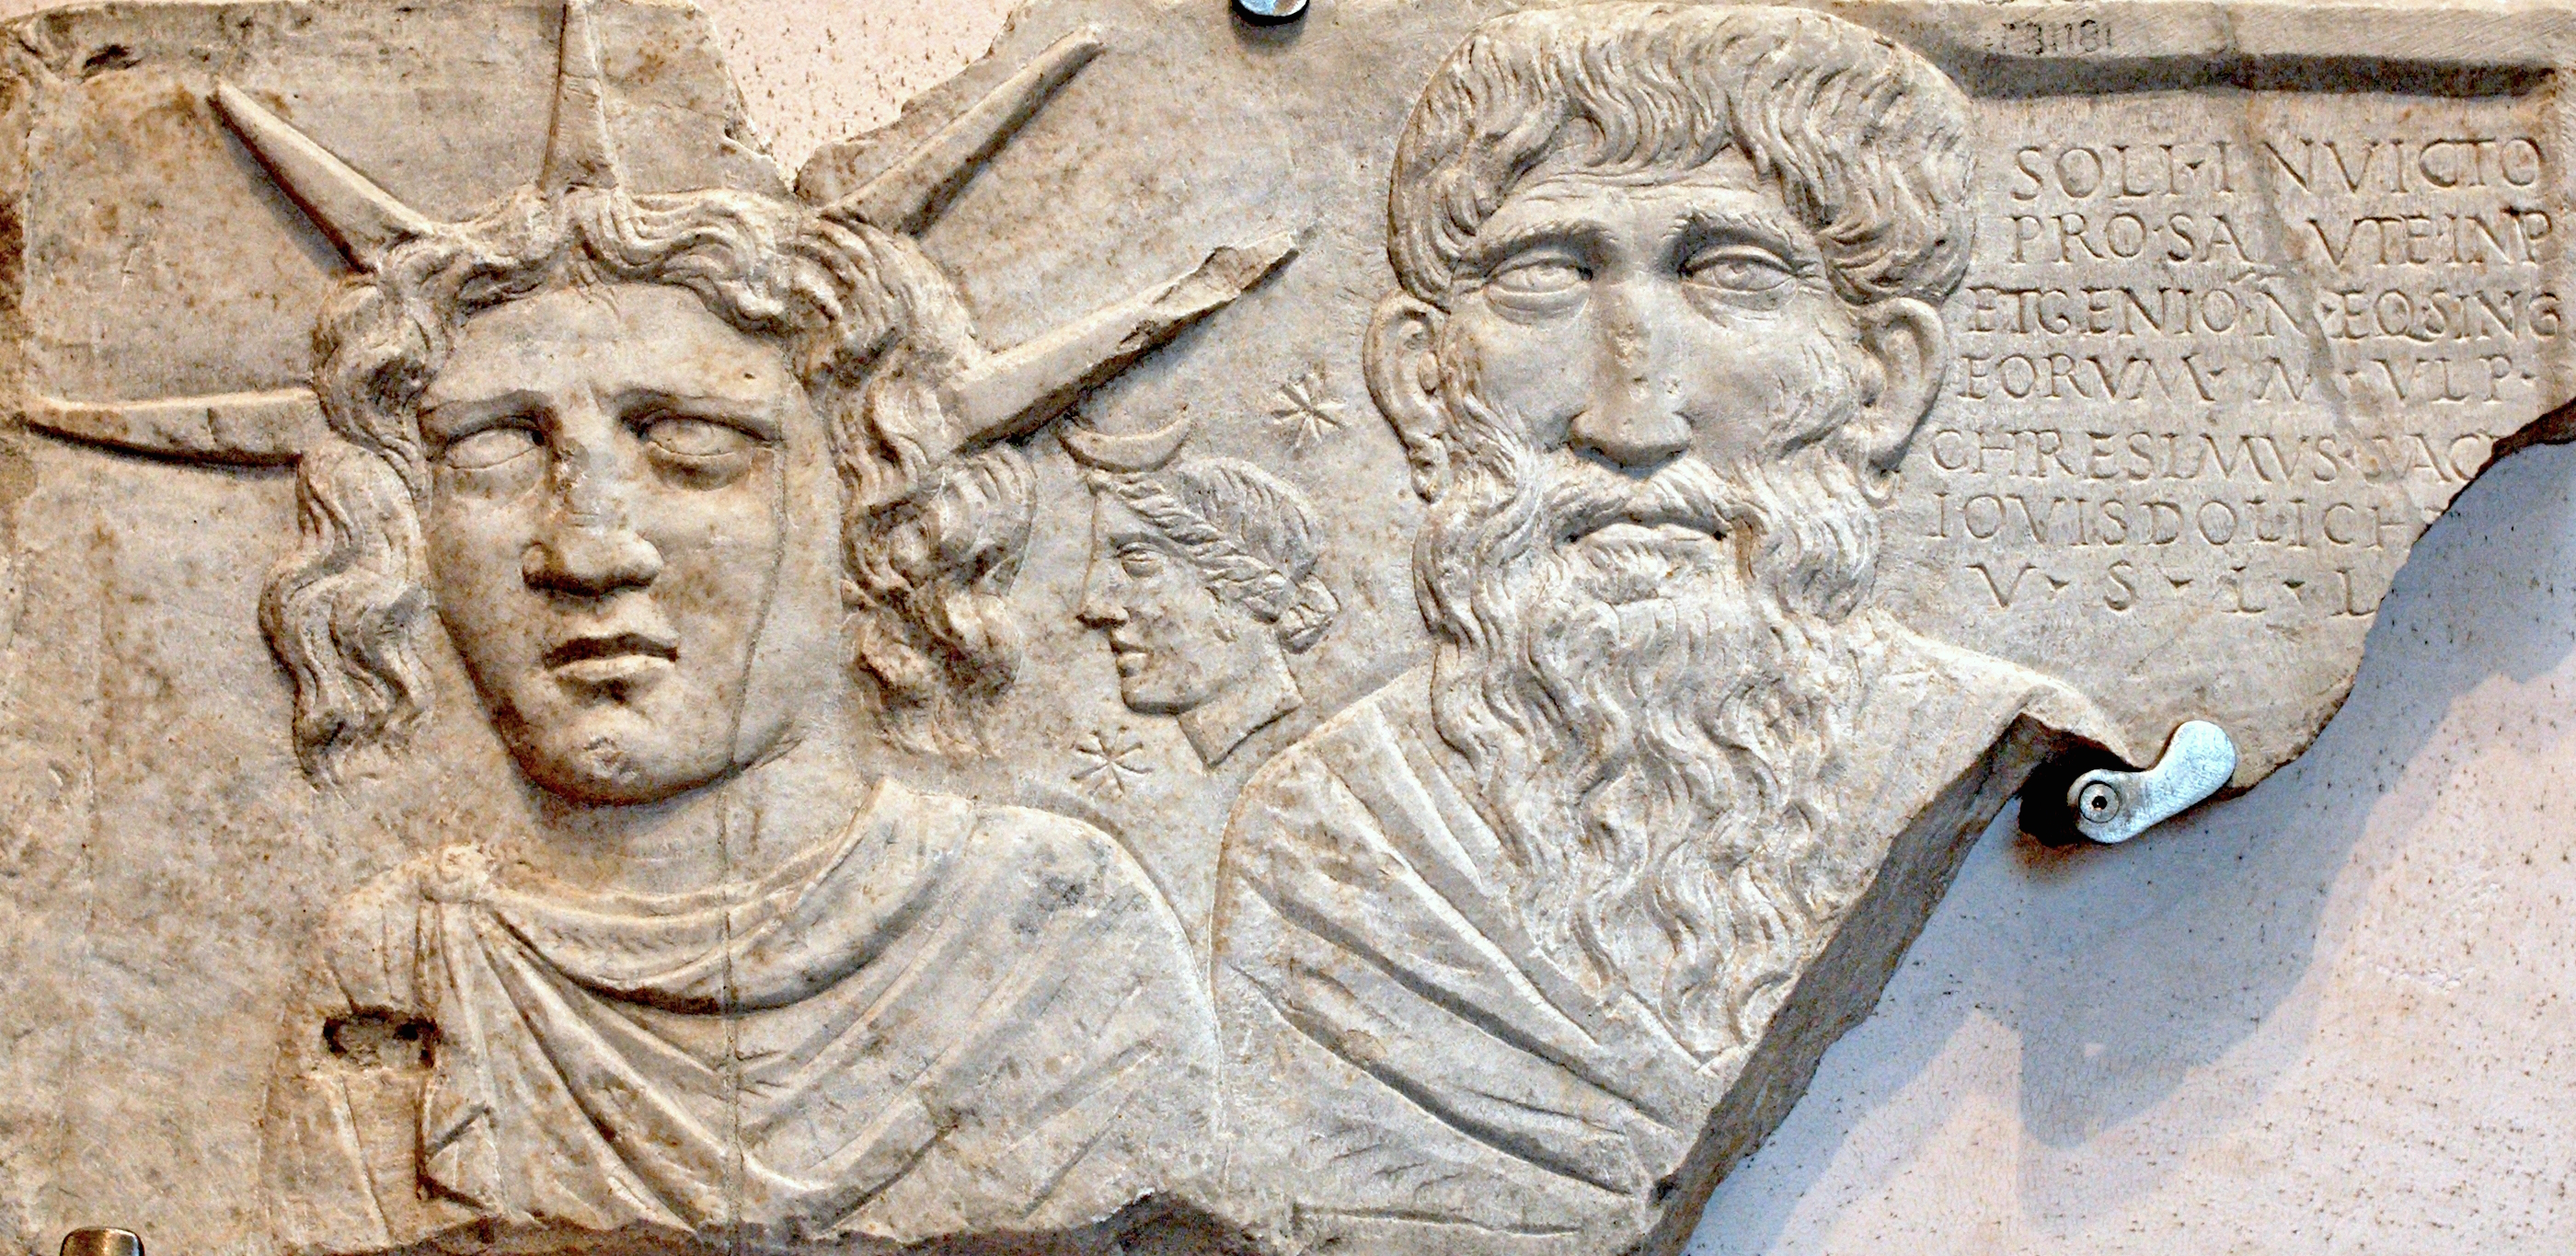 https://i0.wp.com/upload.wikimedia.org/wikipedia/commons/c/ca/Stele_Sol_Invictus_Terme.jpg